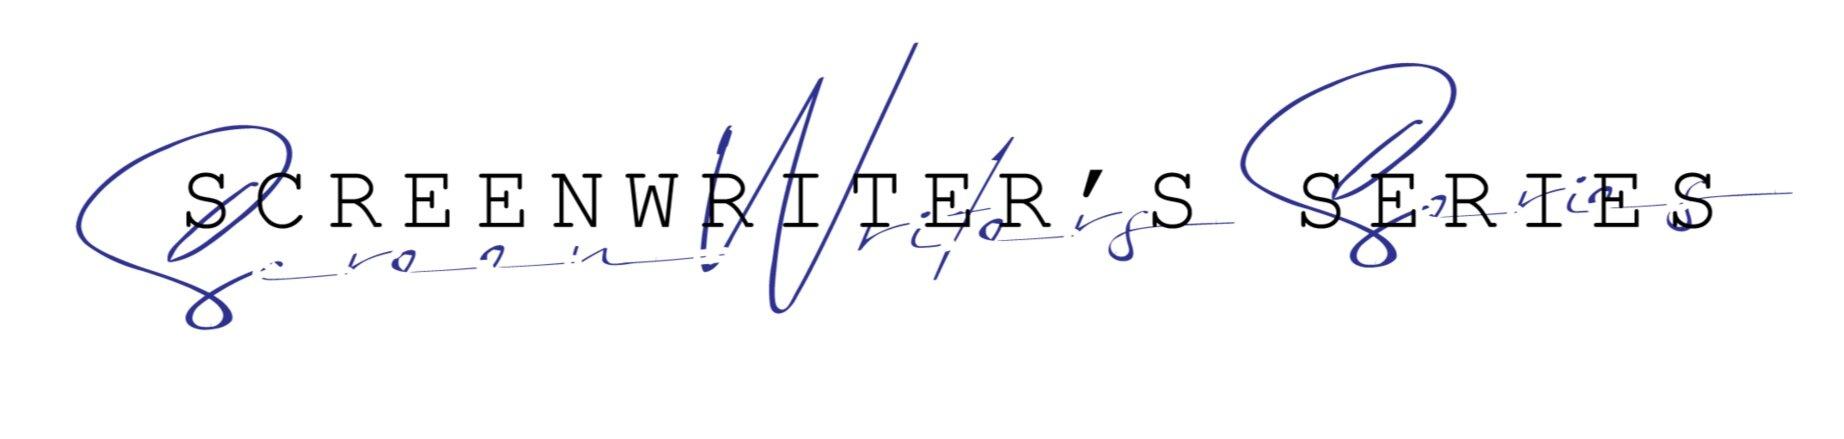 %5Btransparent%5Dseason_screenwriter%27s+series.jpg